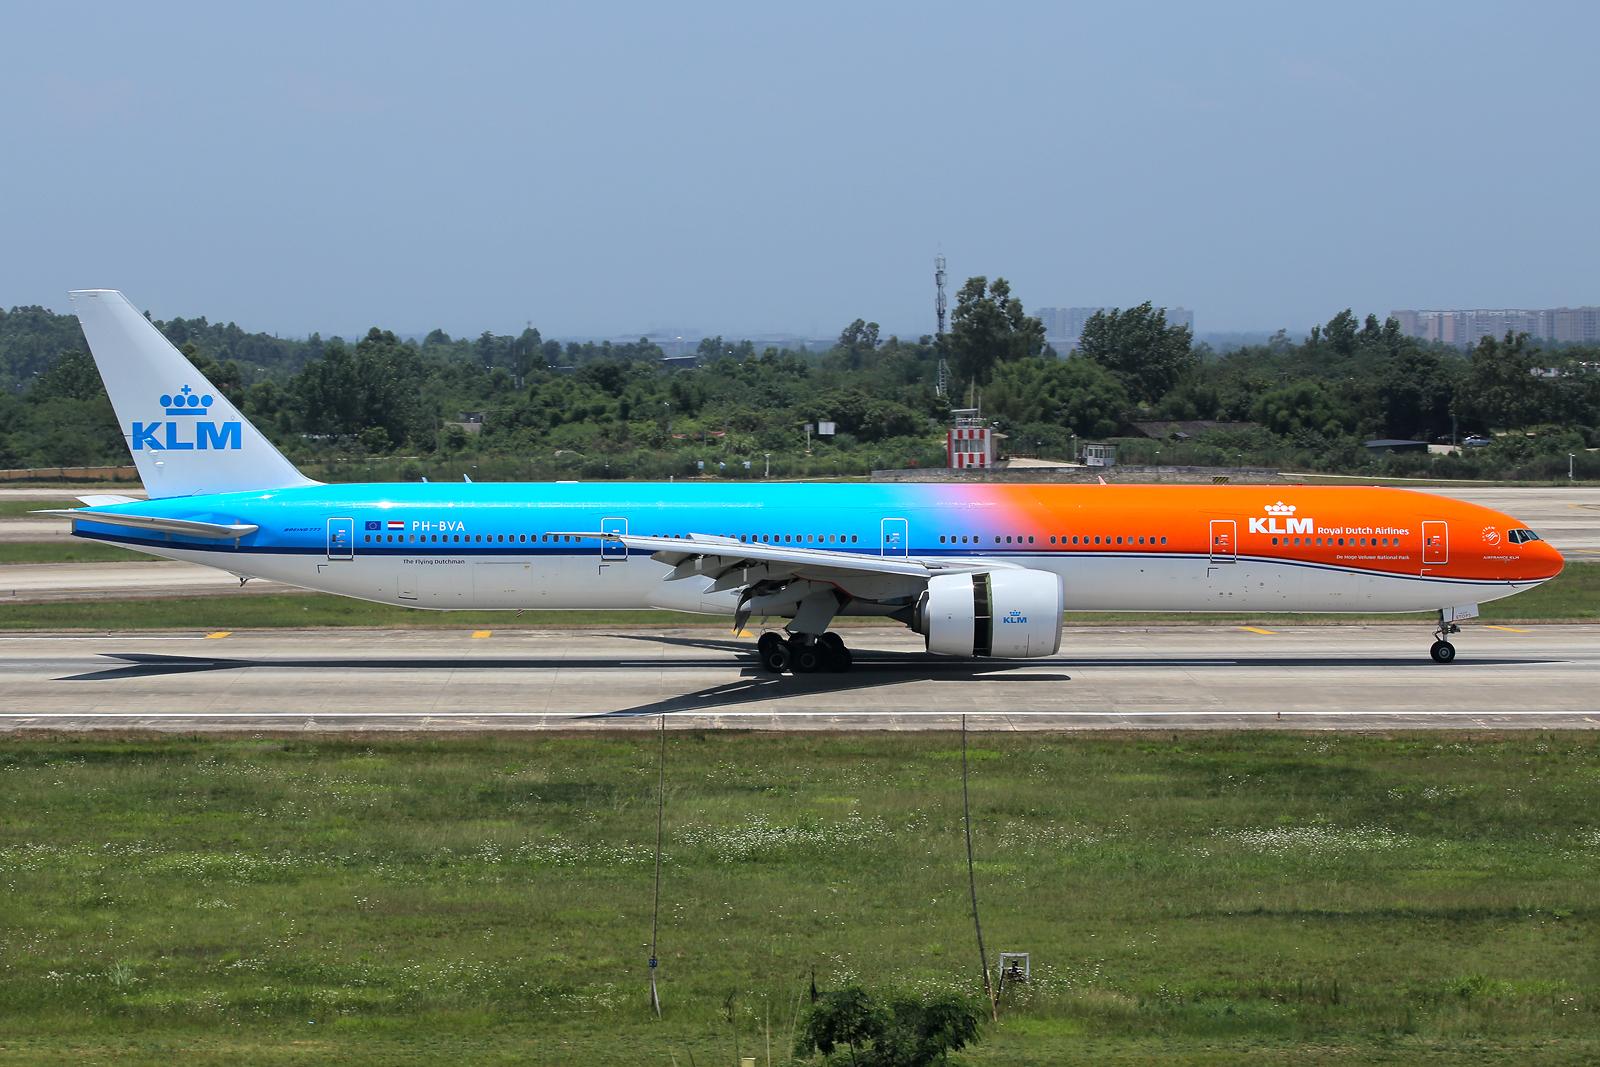 Re:[CCFA] CTU 成都六月绝对的惊喜,KLM荷兰皇家航空Orange Pride首次亲吻成都!!!!!!! BOEING 777-300ER PH-BVA 中国成都双流国际机场